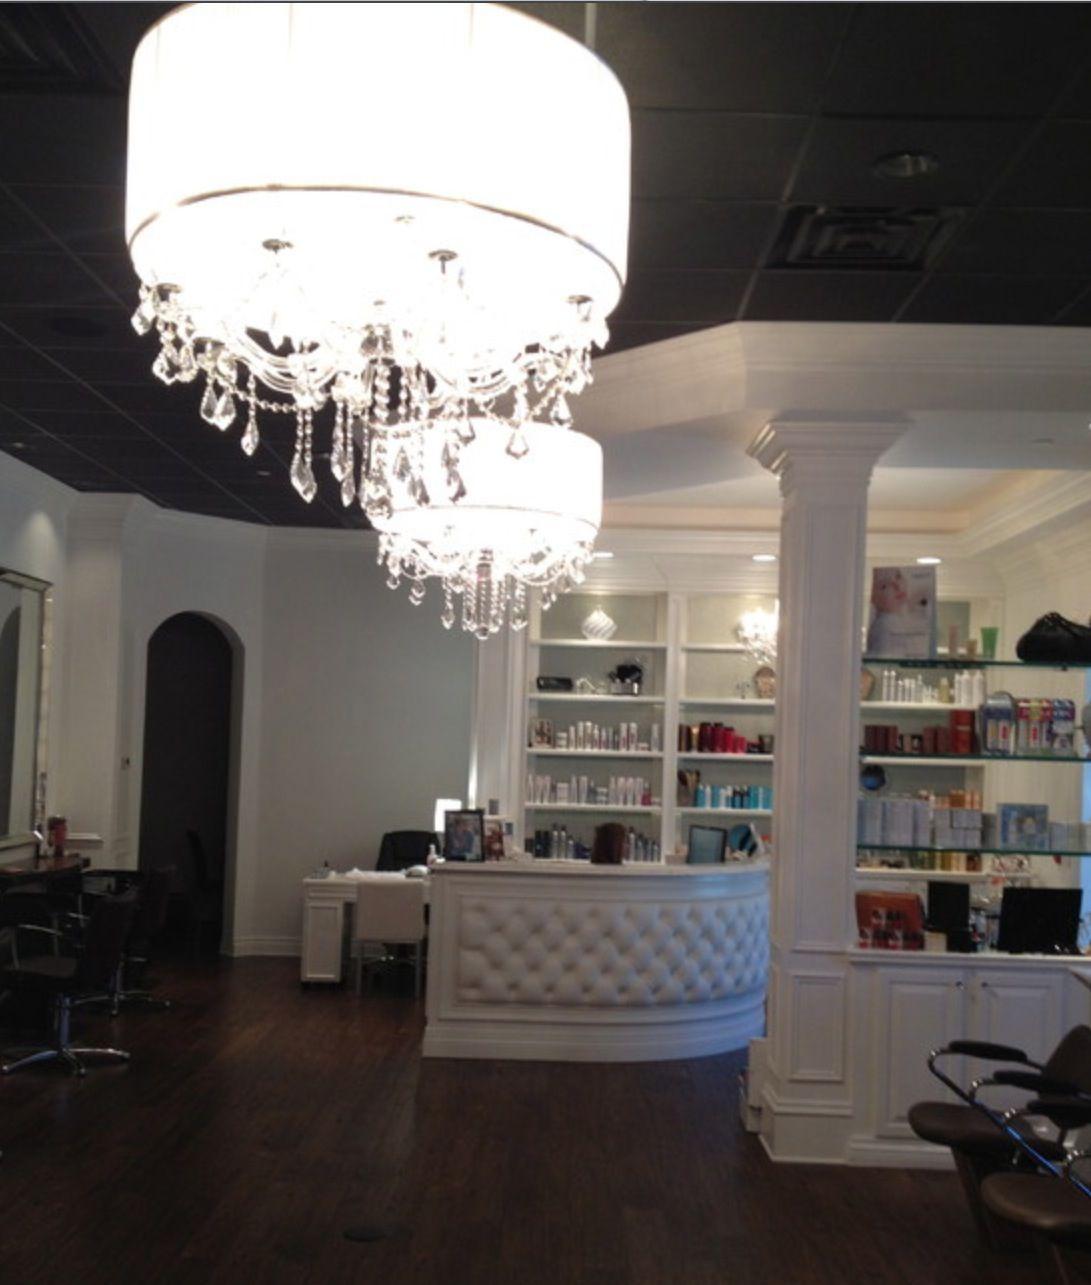 Hair salon | Dramatic Black and White | Pinterest | Salons, Salon ...